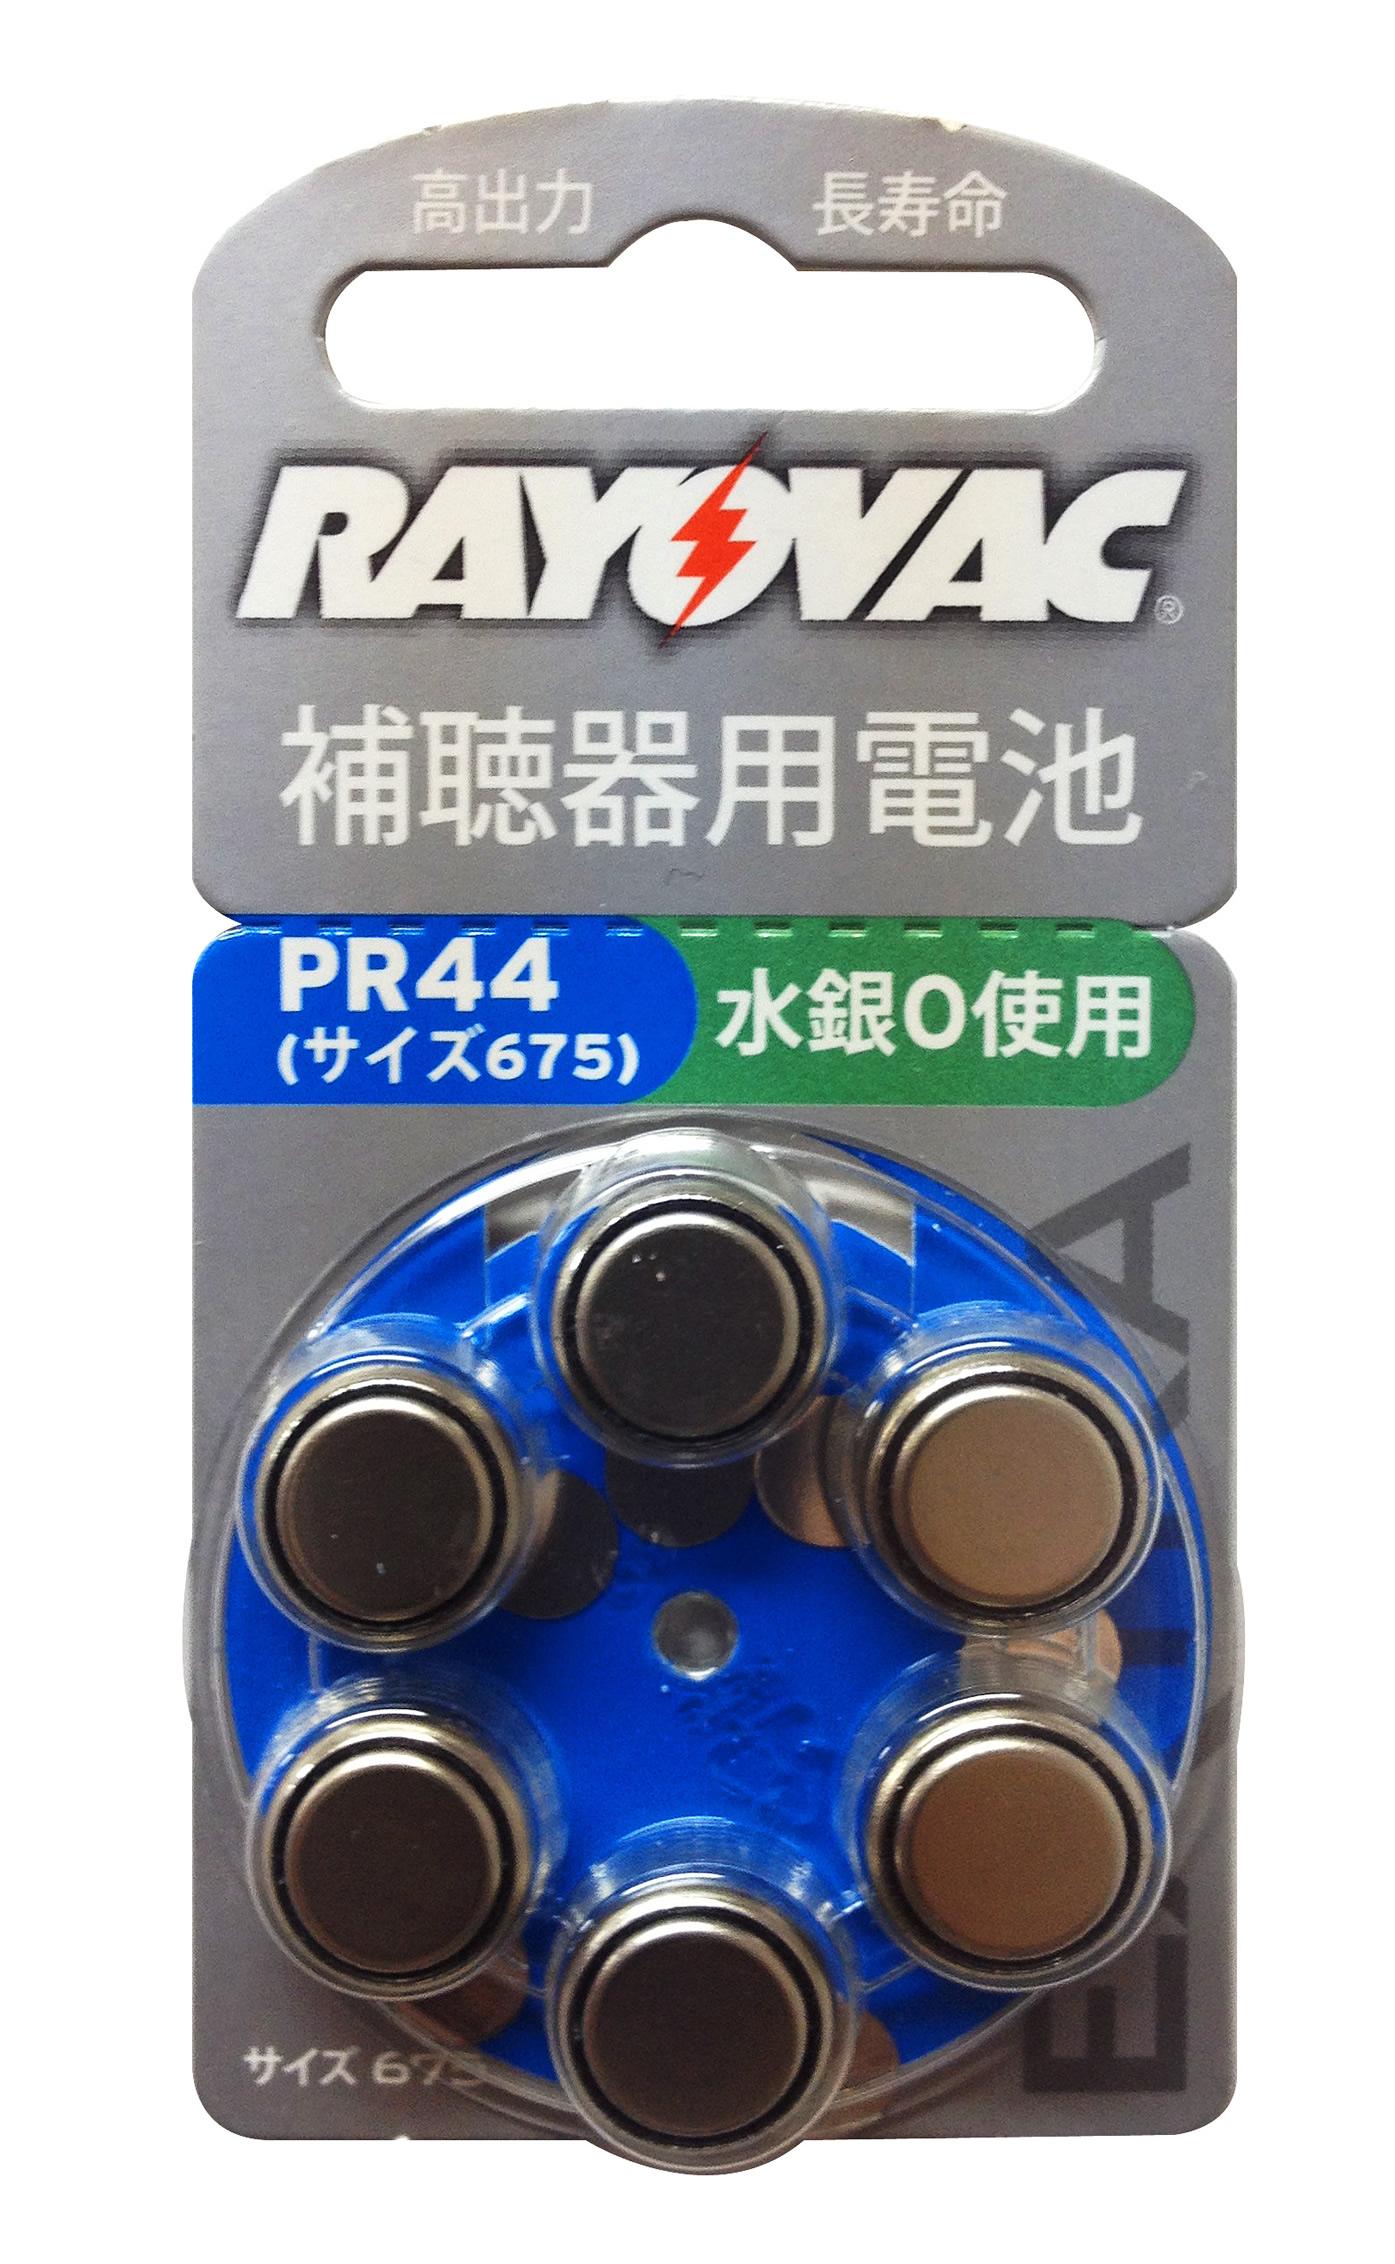 Rayovac 無水銀電池 PR44-675 6個入り